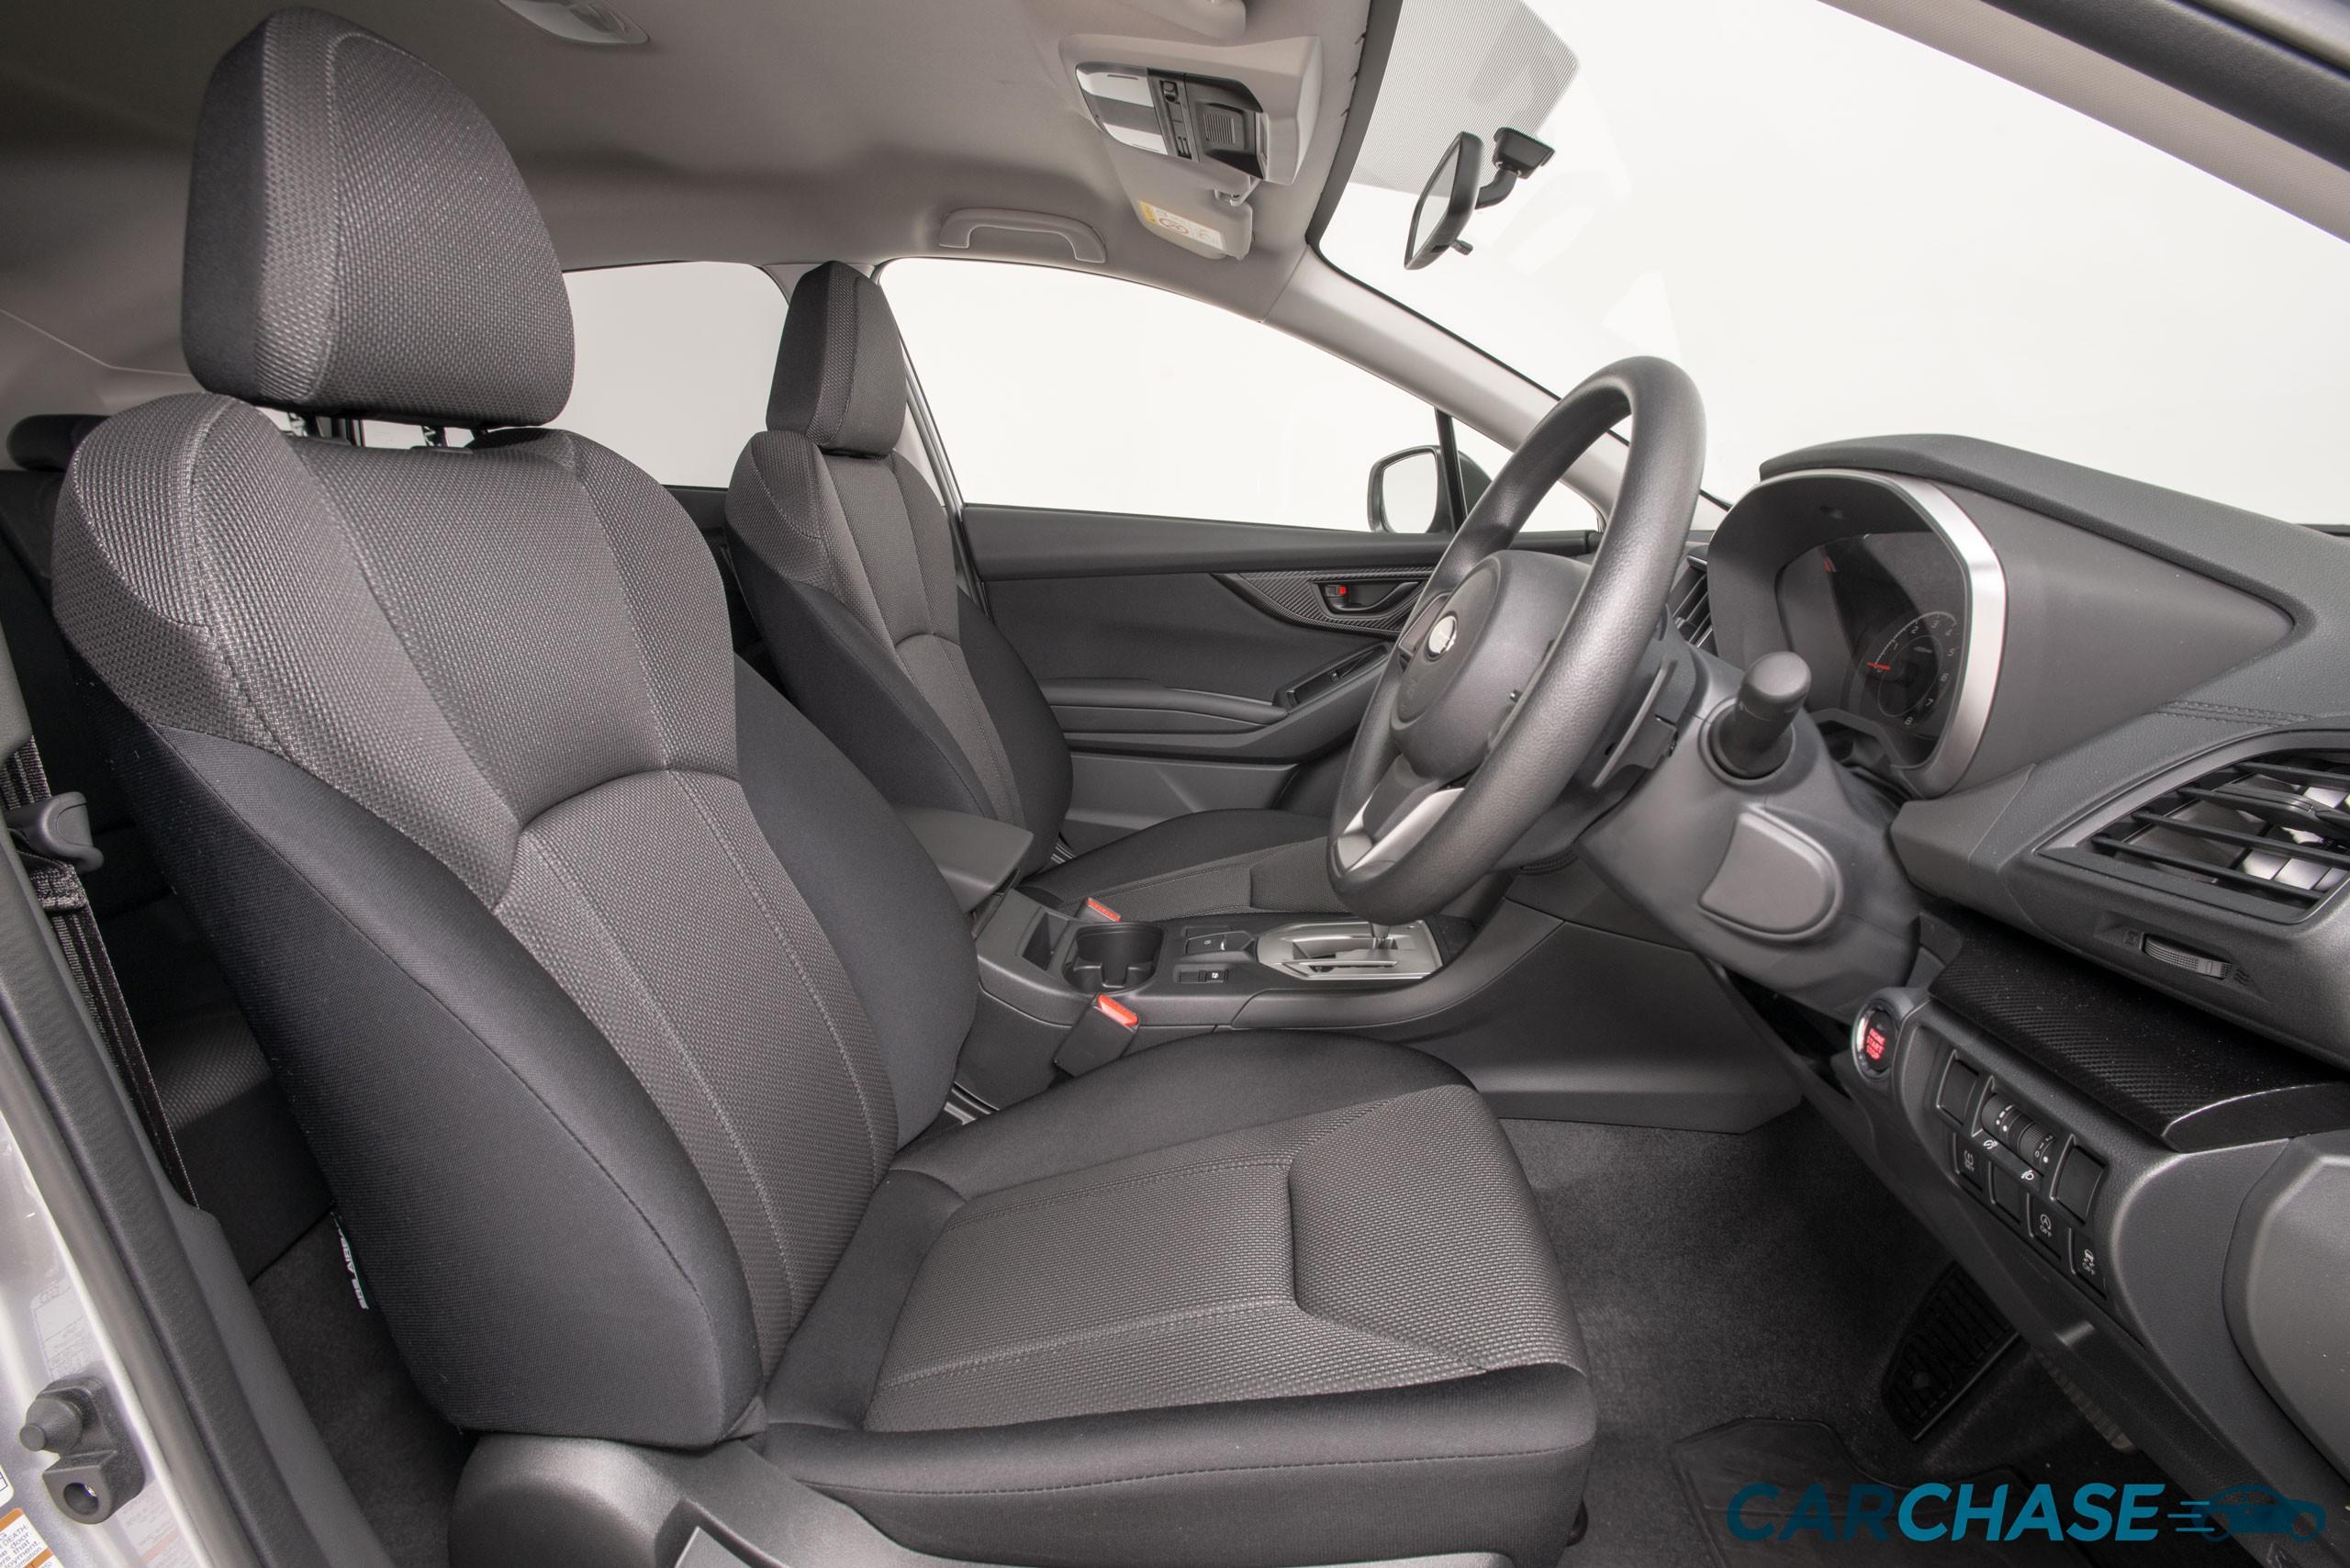 Image of driver front profile of 2018 Subaru Impreza 2.0i